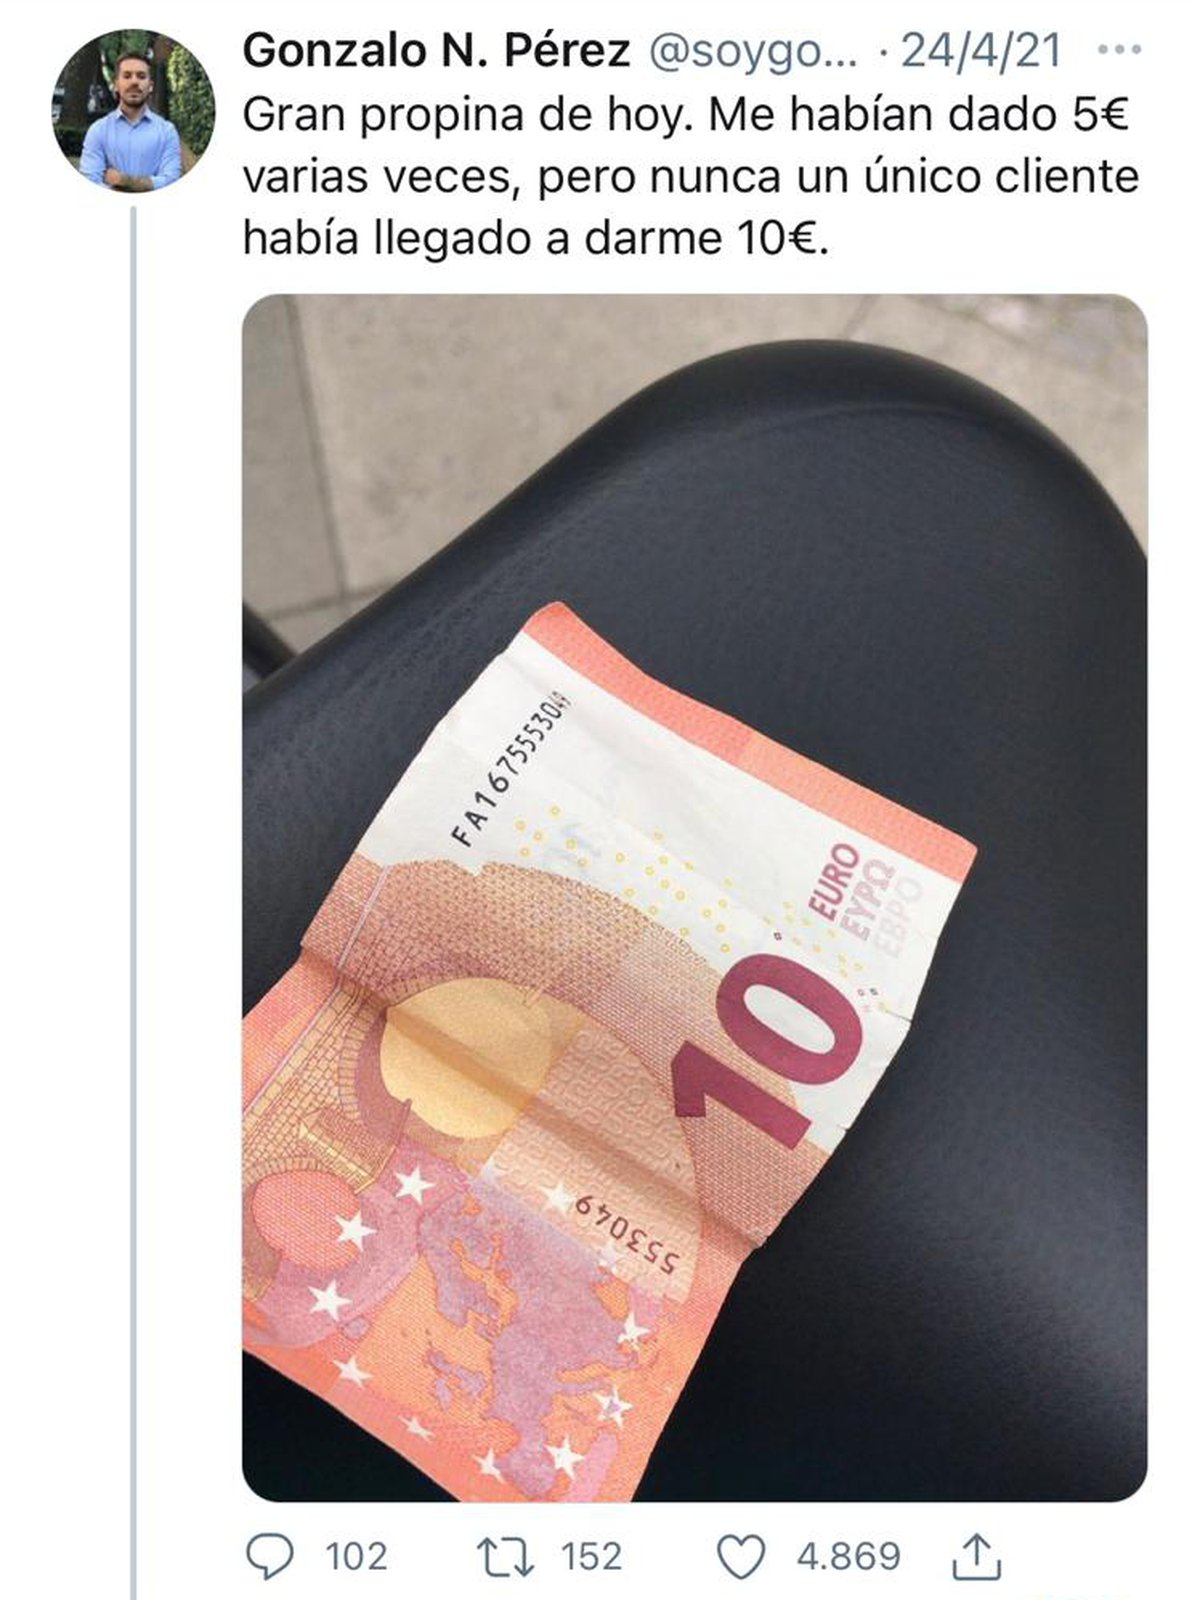 Su récord: Gonzalo llegó a recibir 10 euros de propina